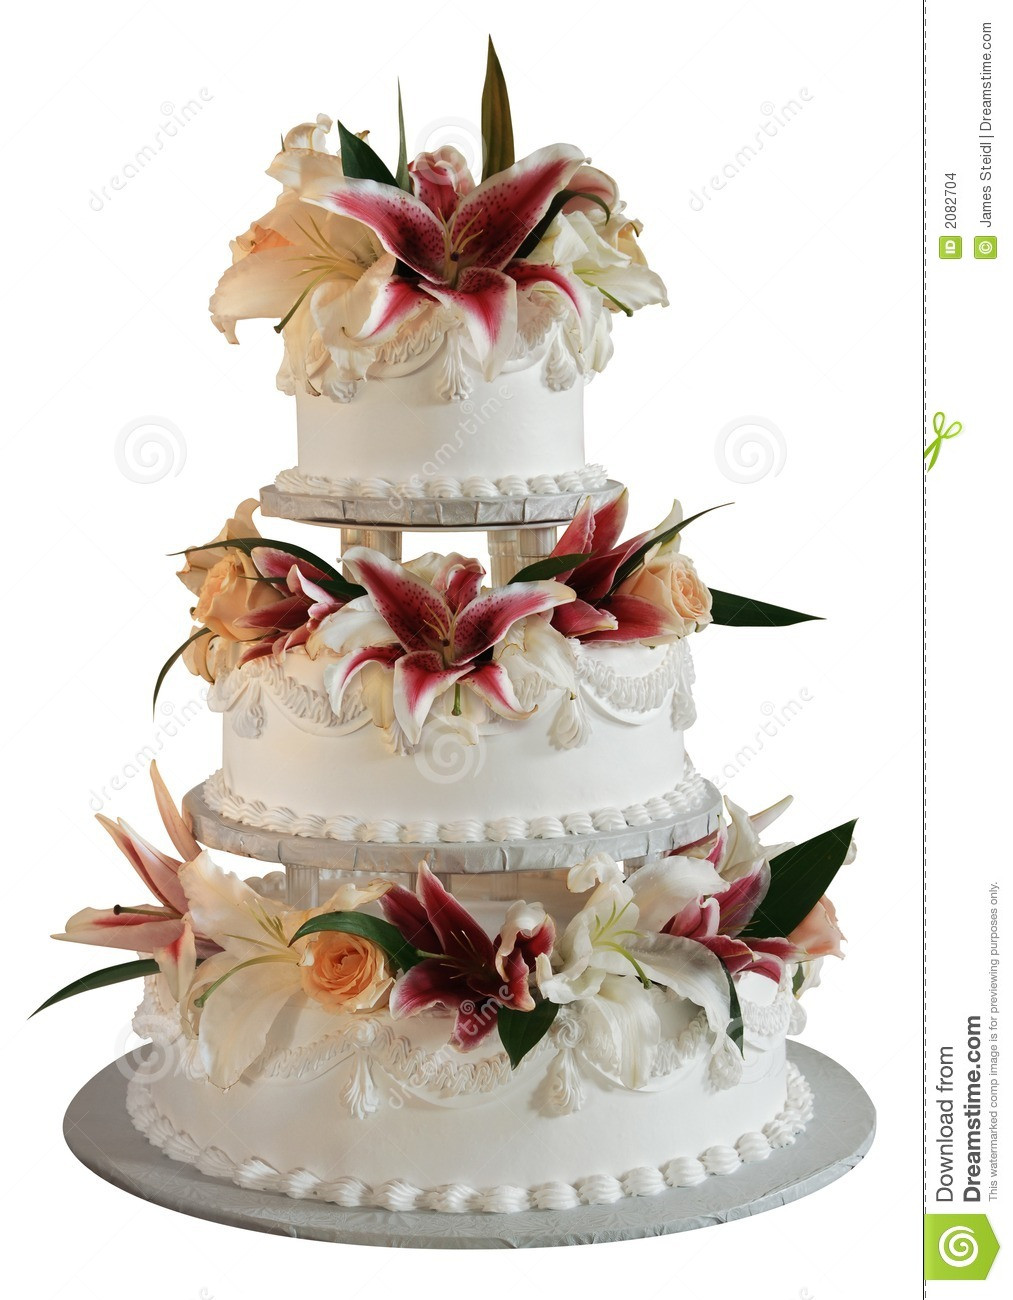 3 Layer Wedding Cakes  3 layer wedding cake stock photo Image of roses bride